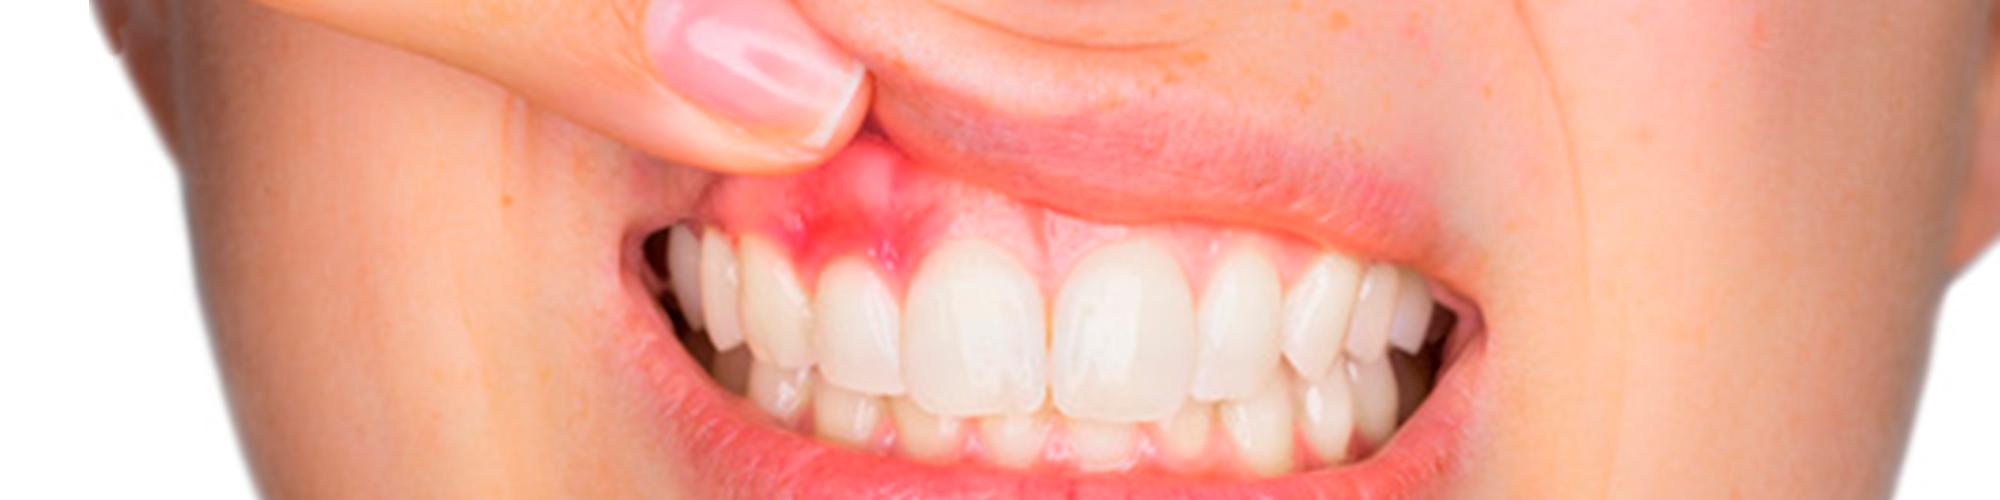 Problemas de gingivitis